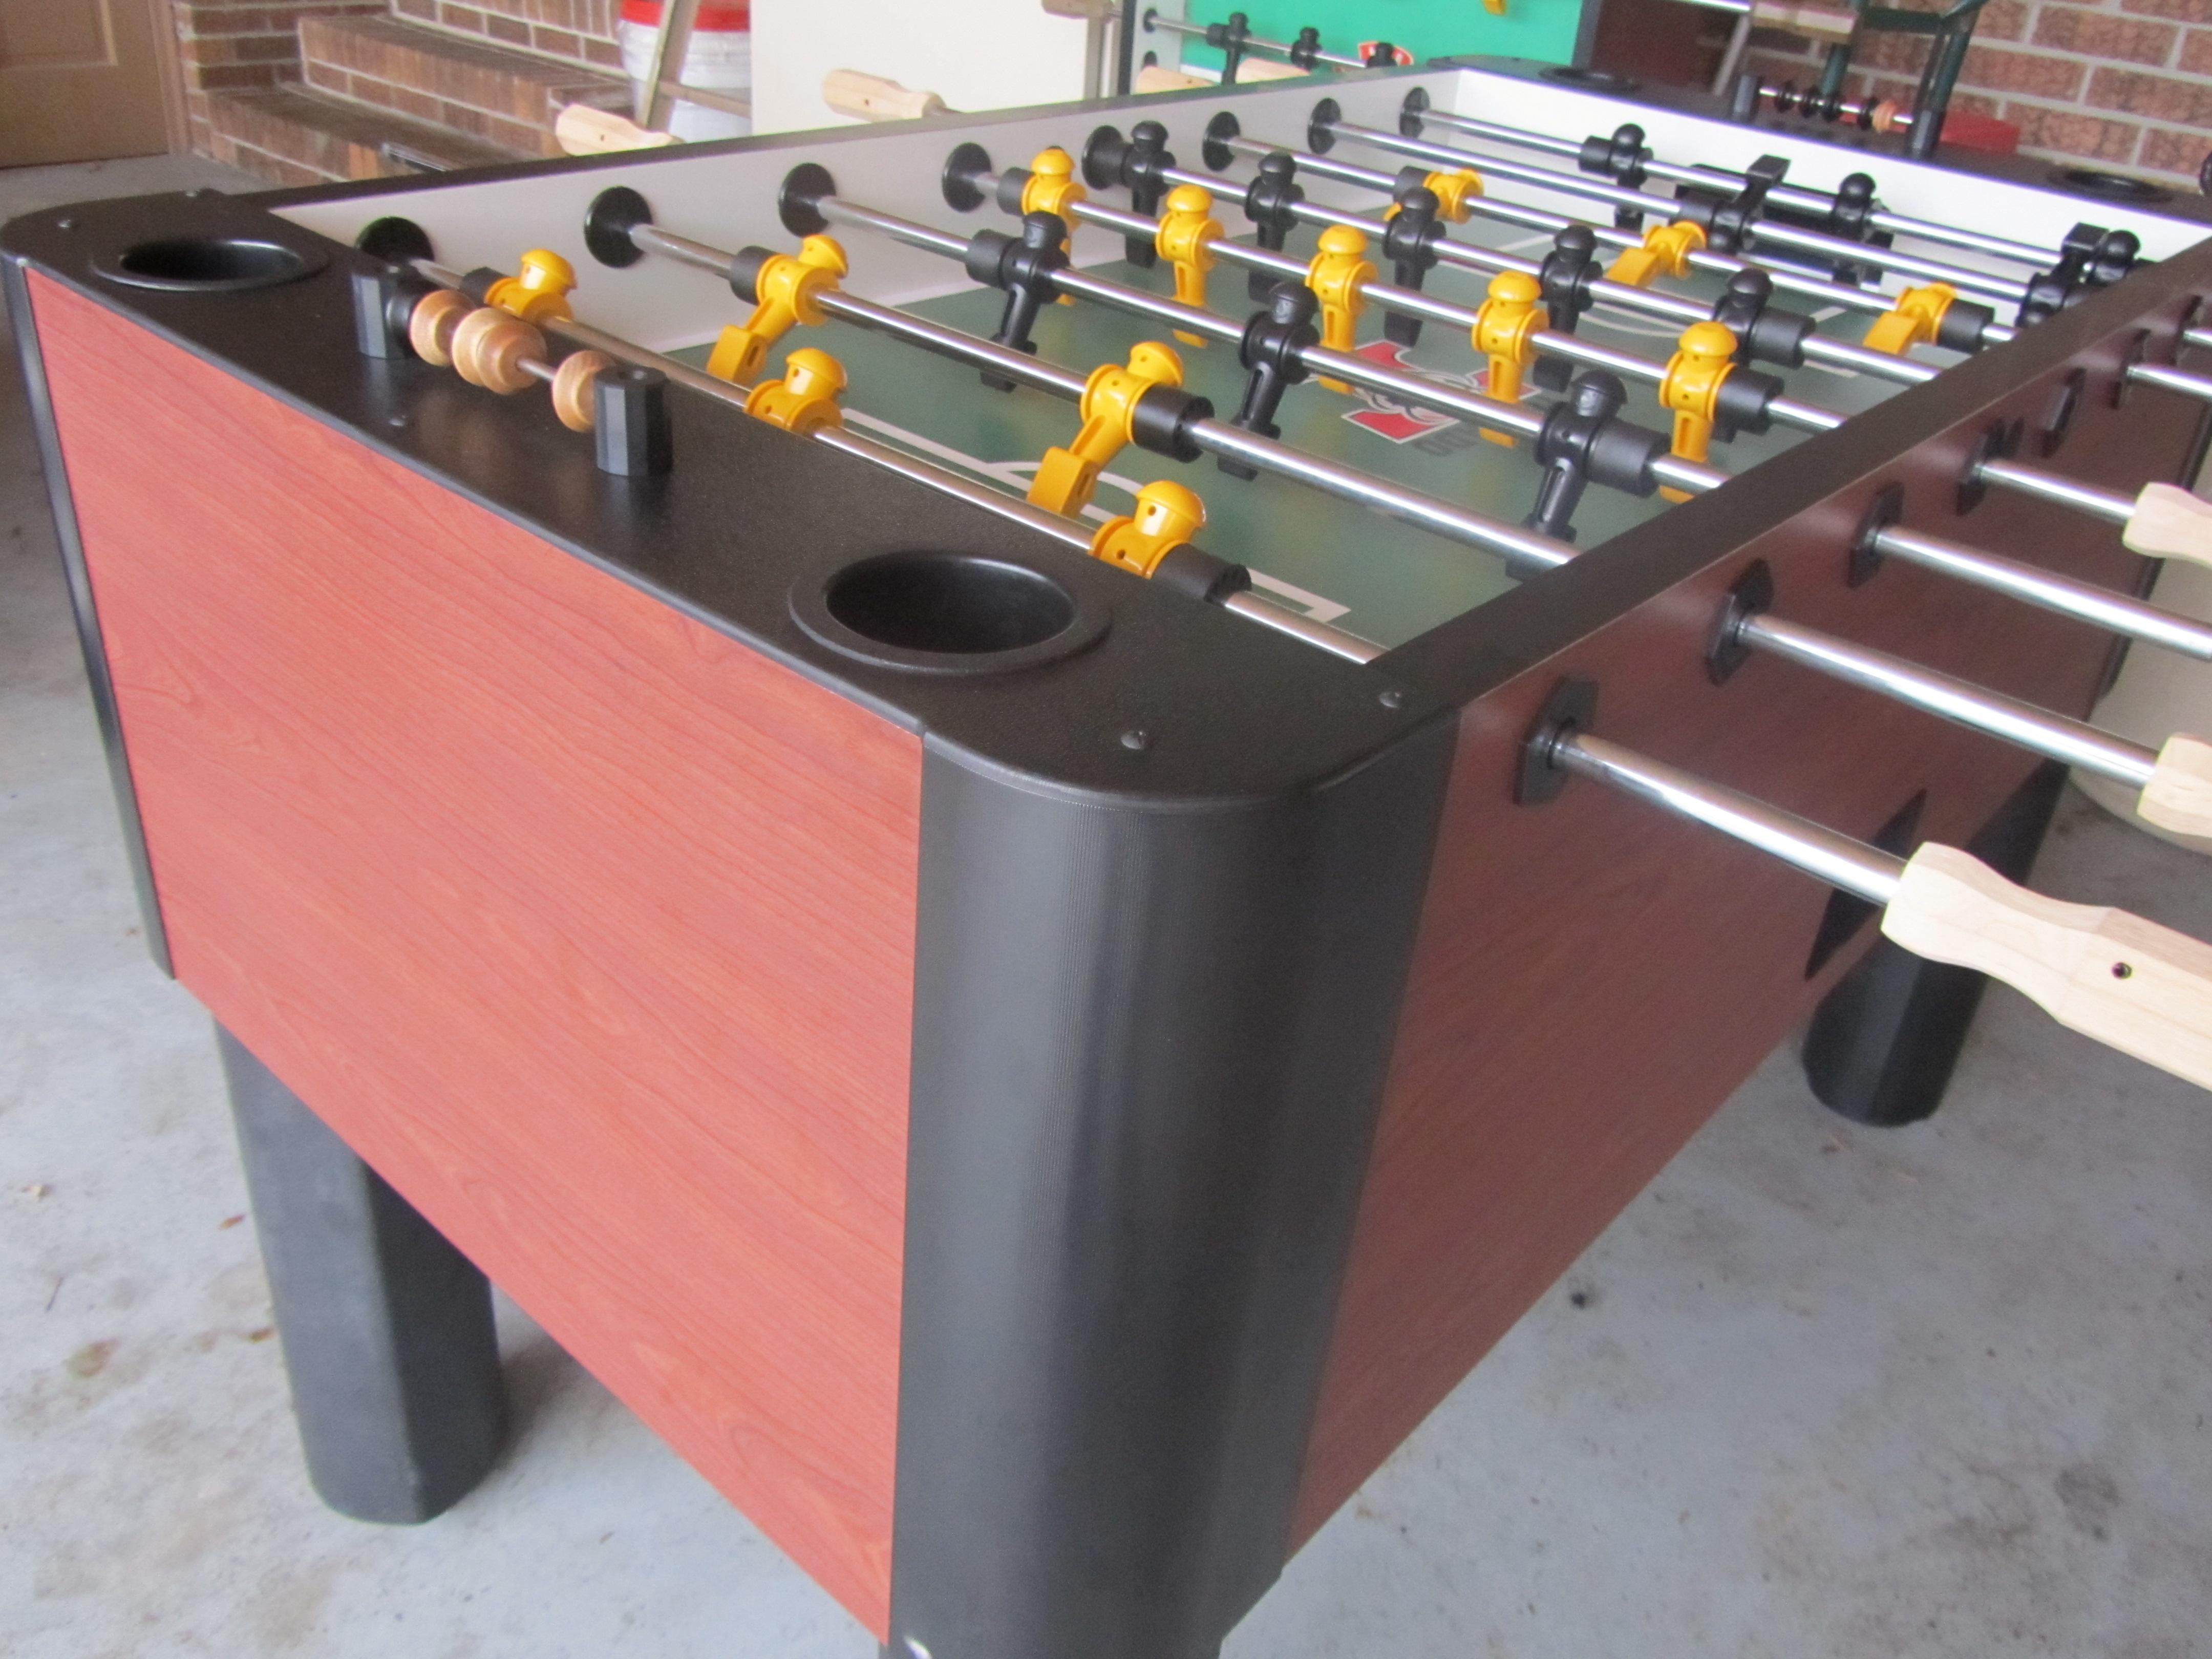 Used tornado foosball table home model used parts forsale - Used tornado foosball table ...